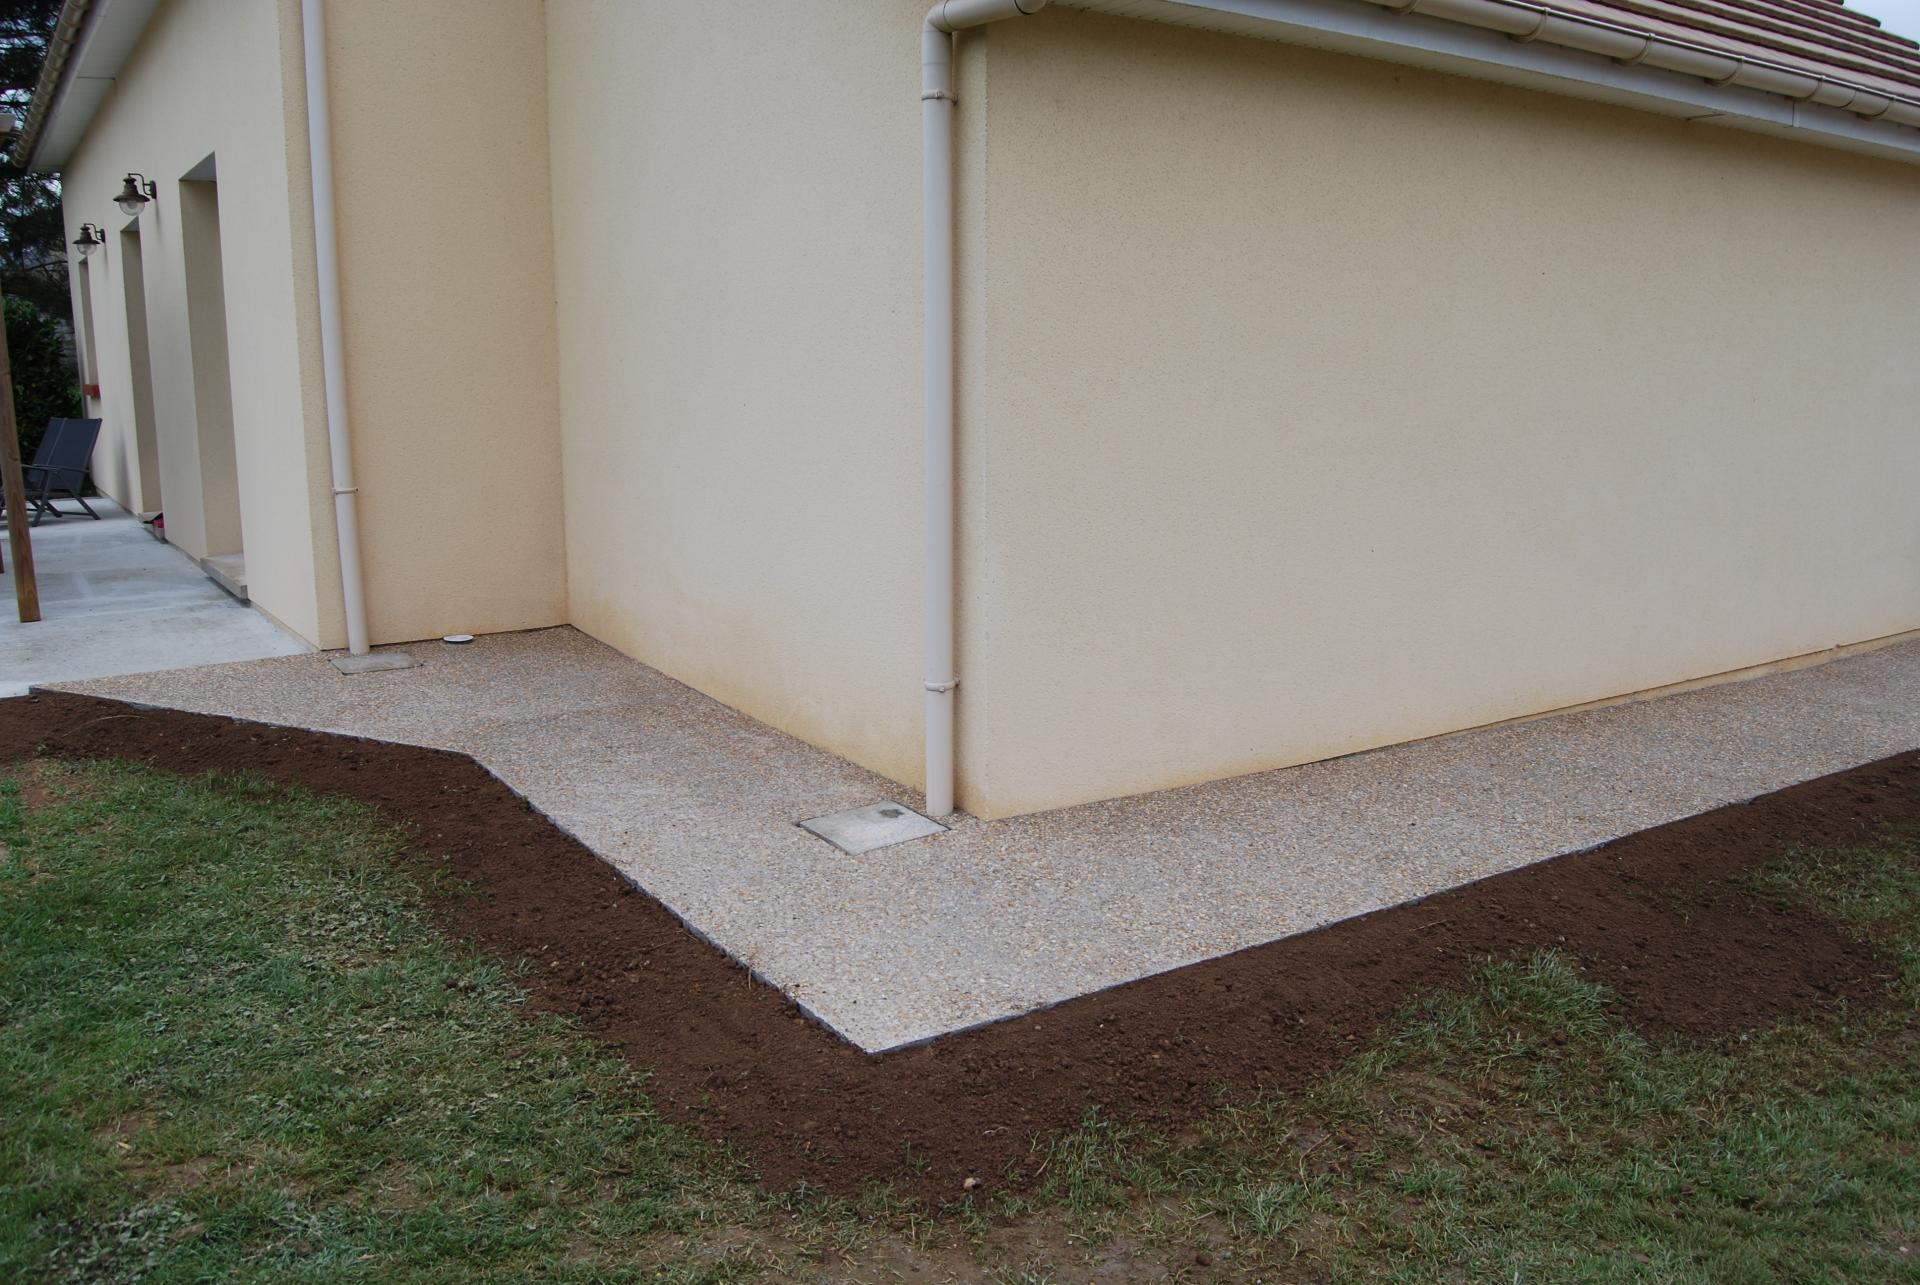 Bordure dall e en bois id e inspirante pour for Peinture terrasse beton avis